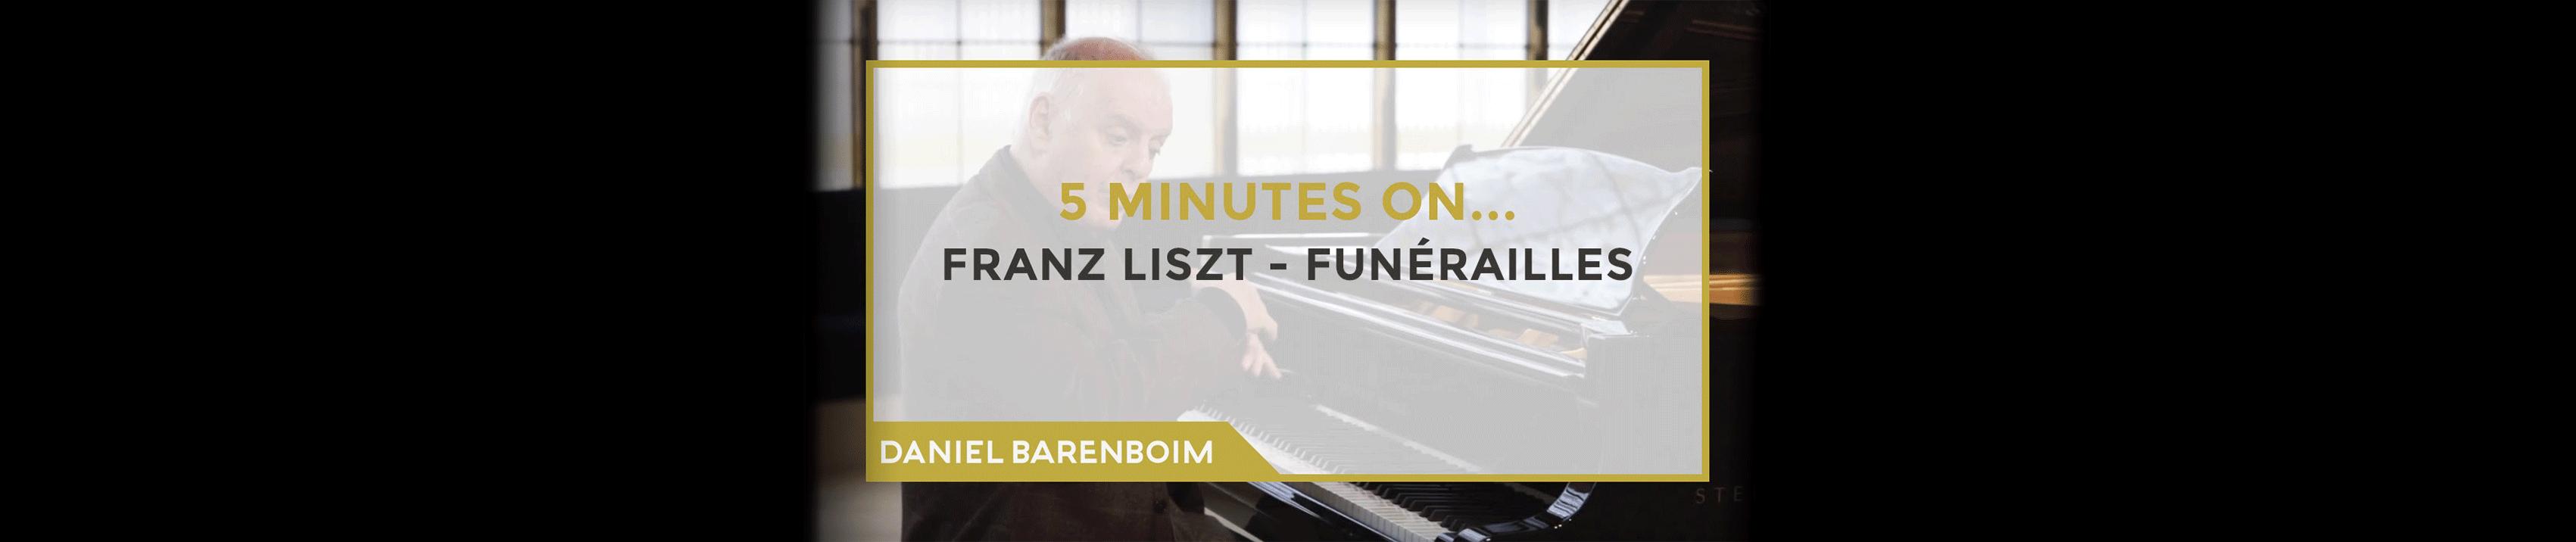 Daniel Barenboim, Liszt's Funérailles